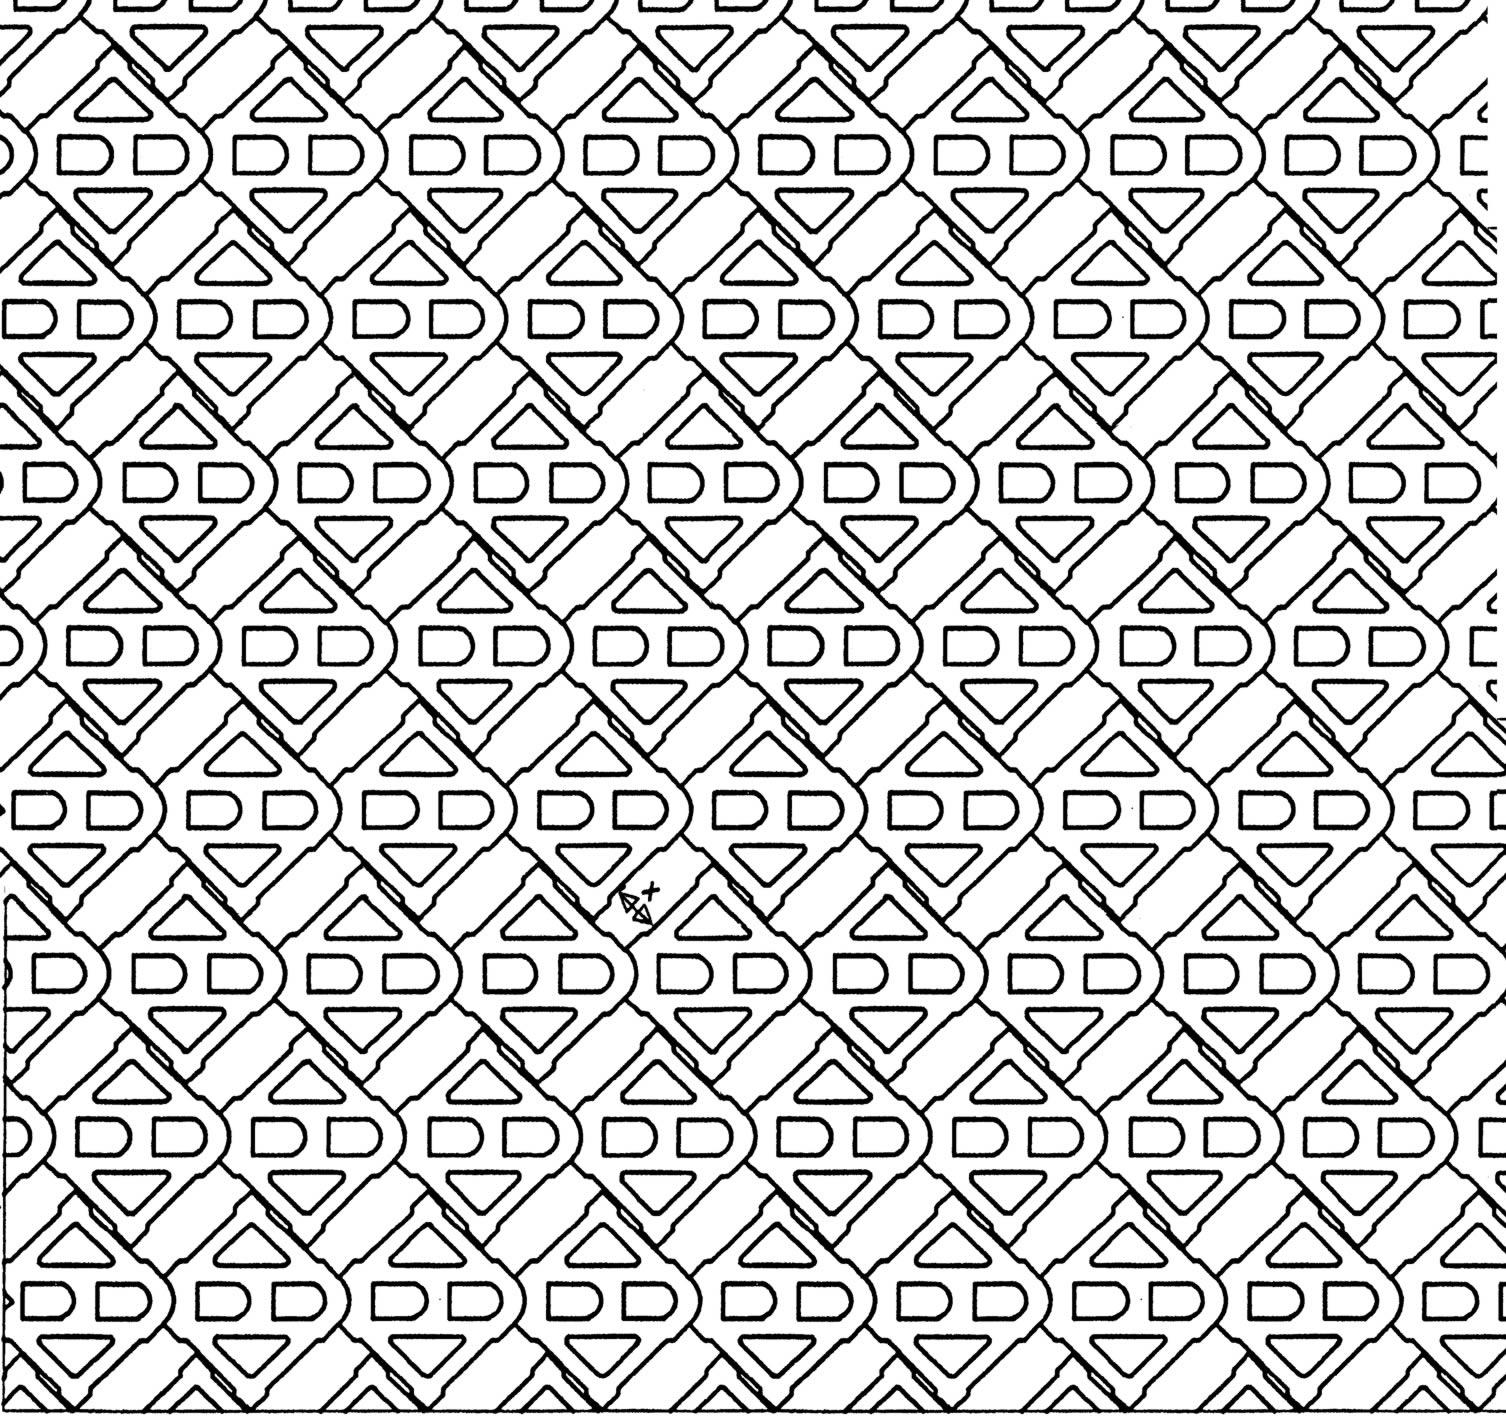 Terracrete hardlawn paver patterns